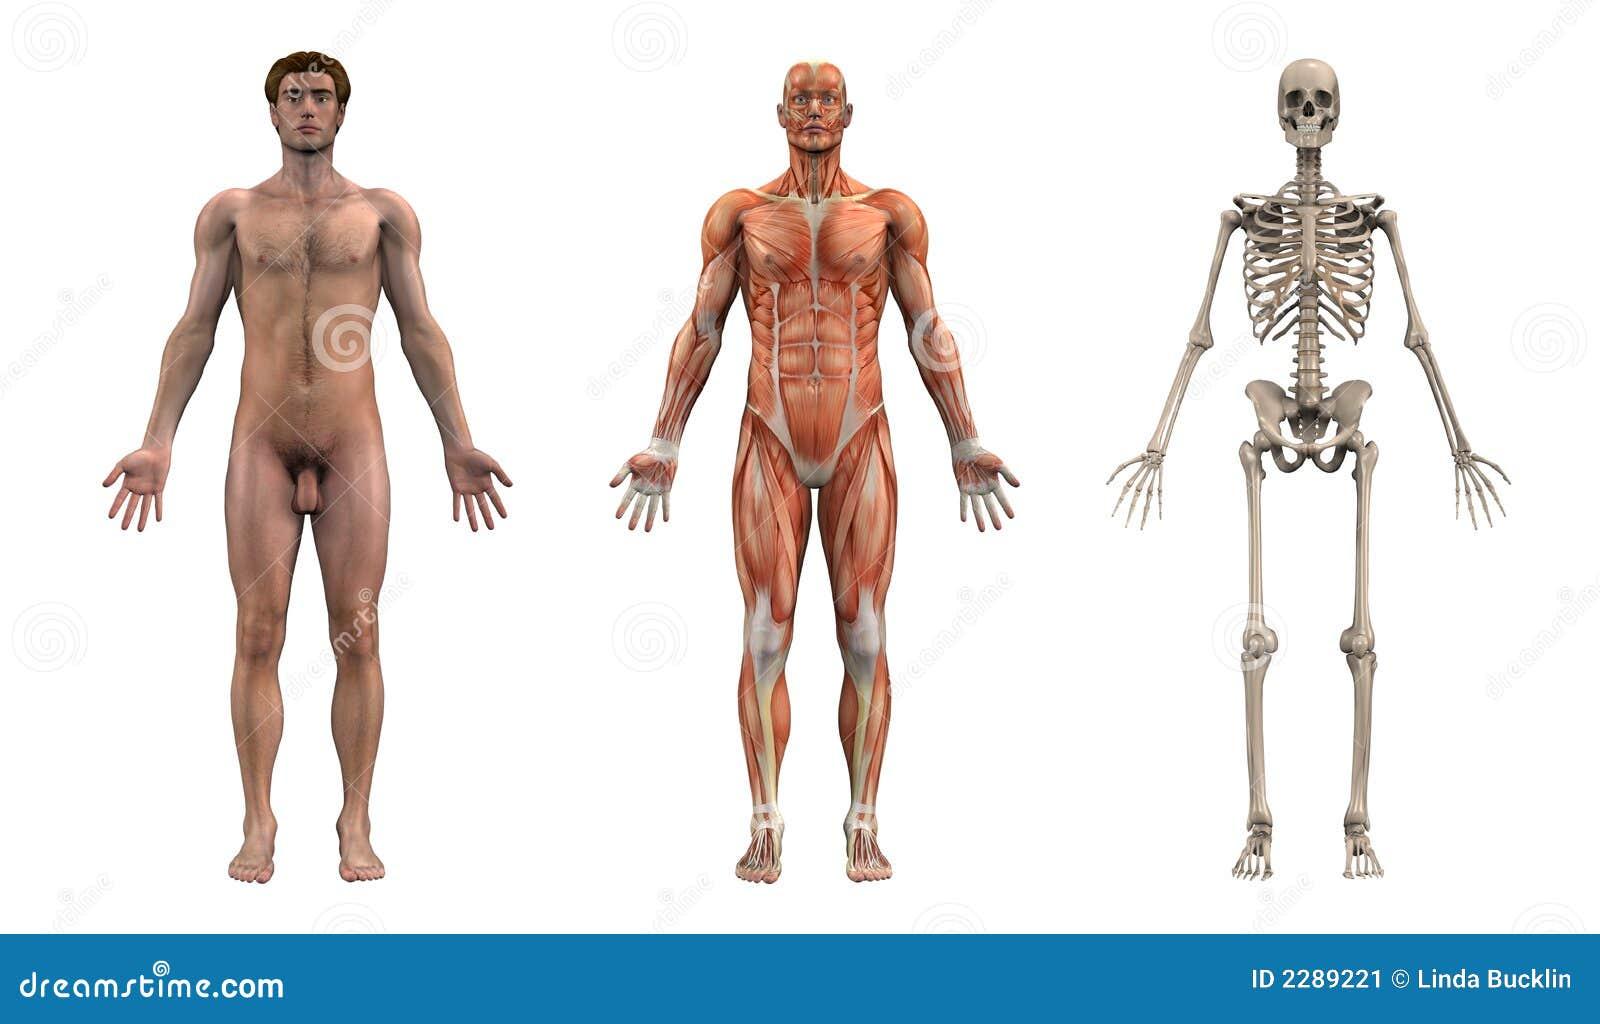 Parte dianteira da anatomia - macho adulto